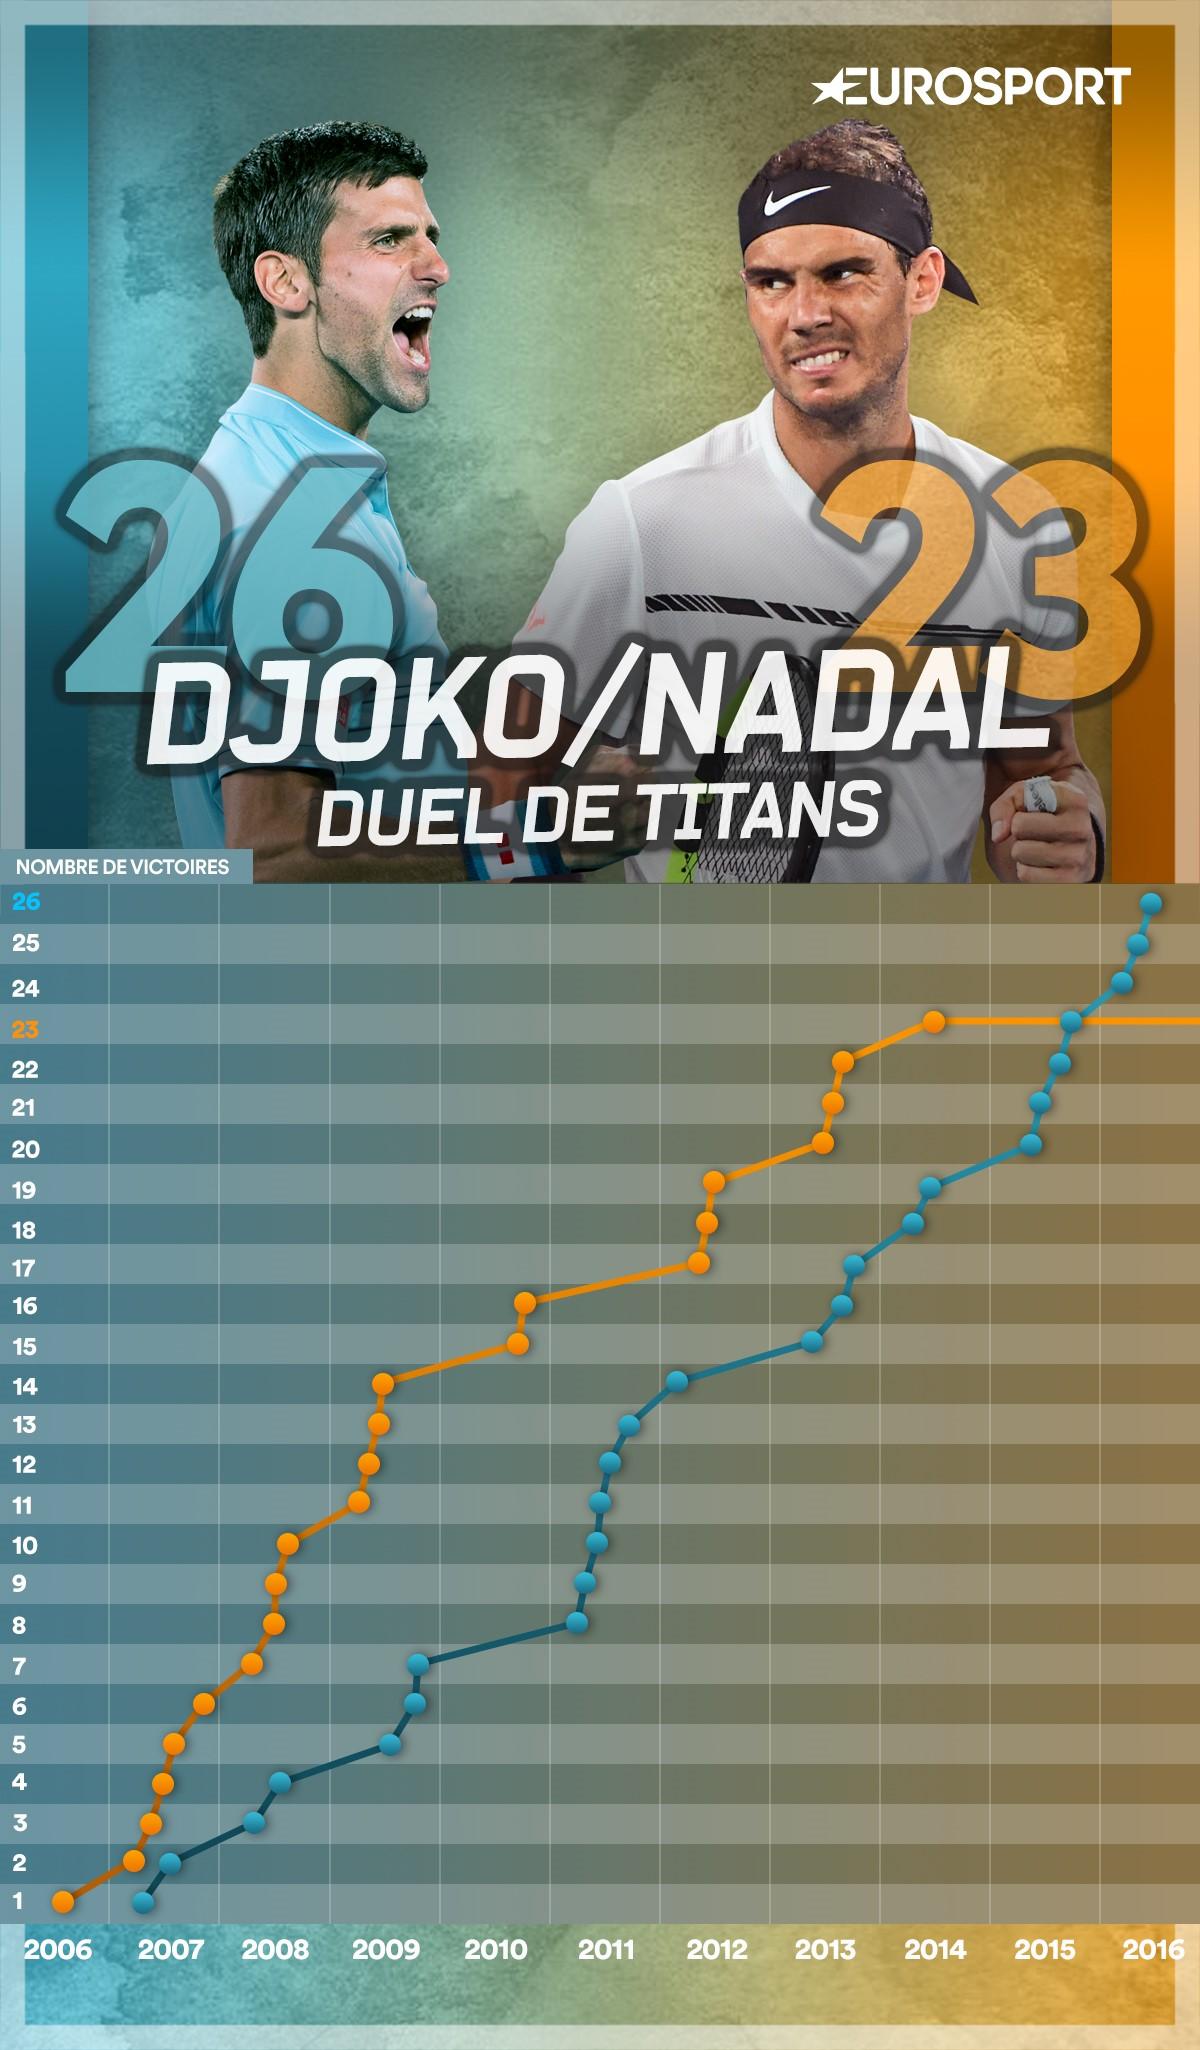 Les confrontations Nadal - Djokovic